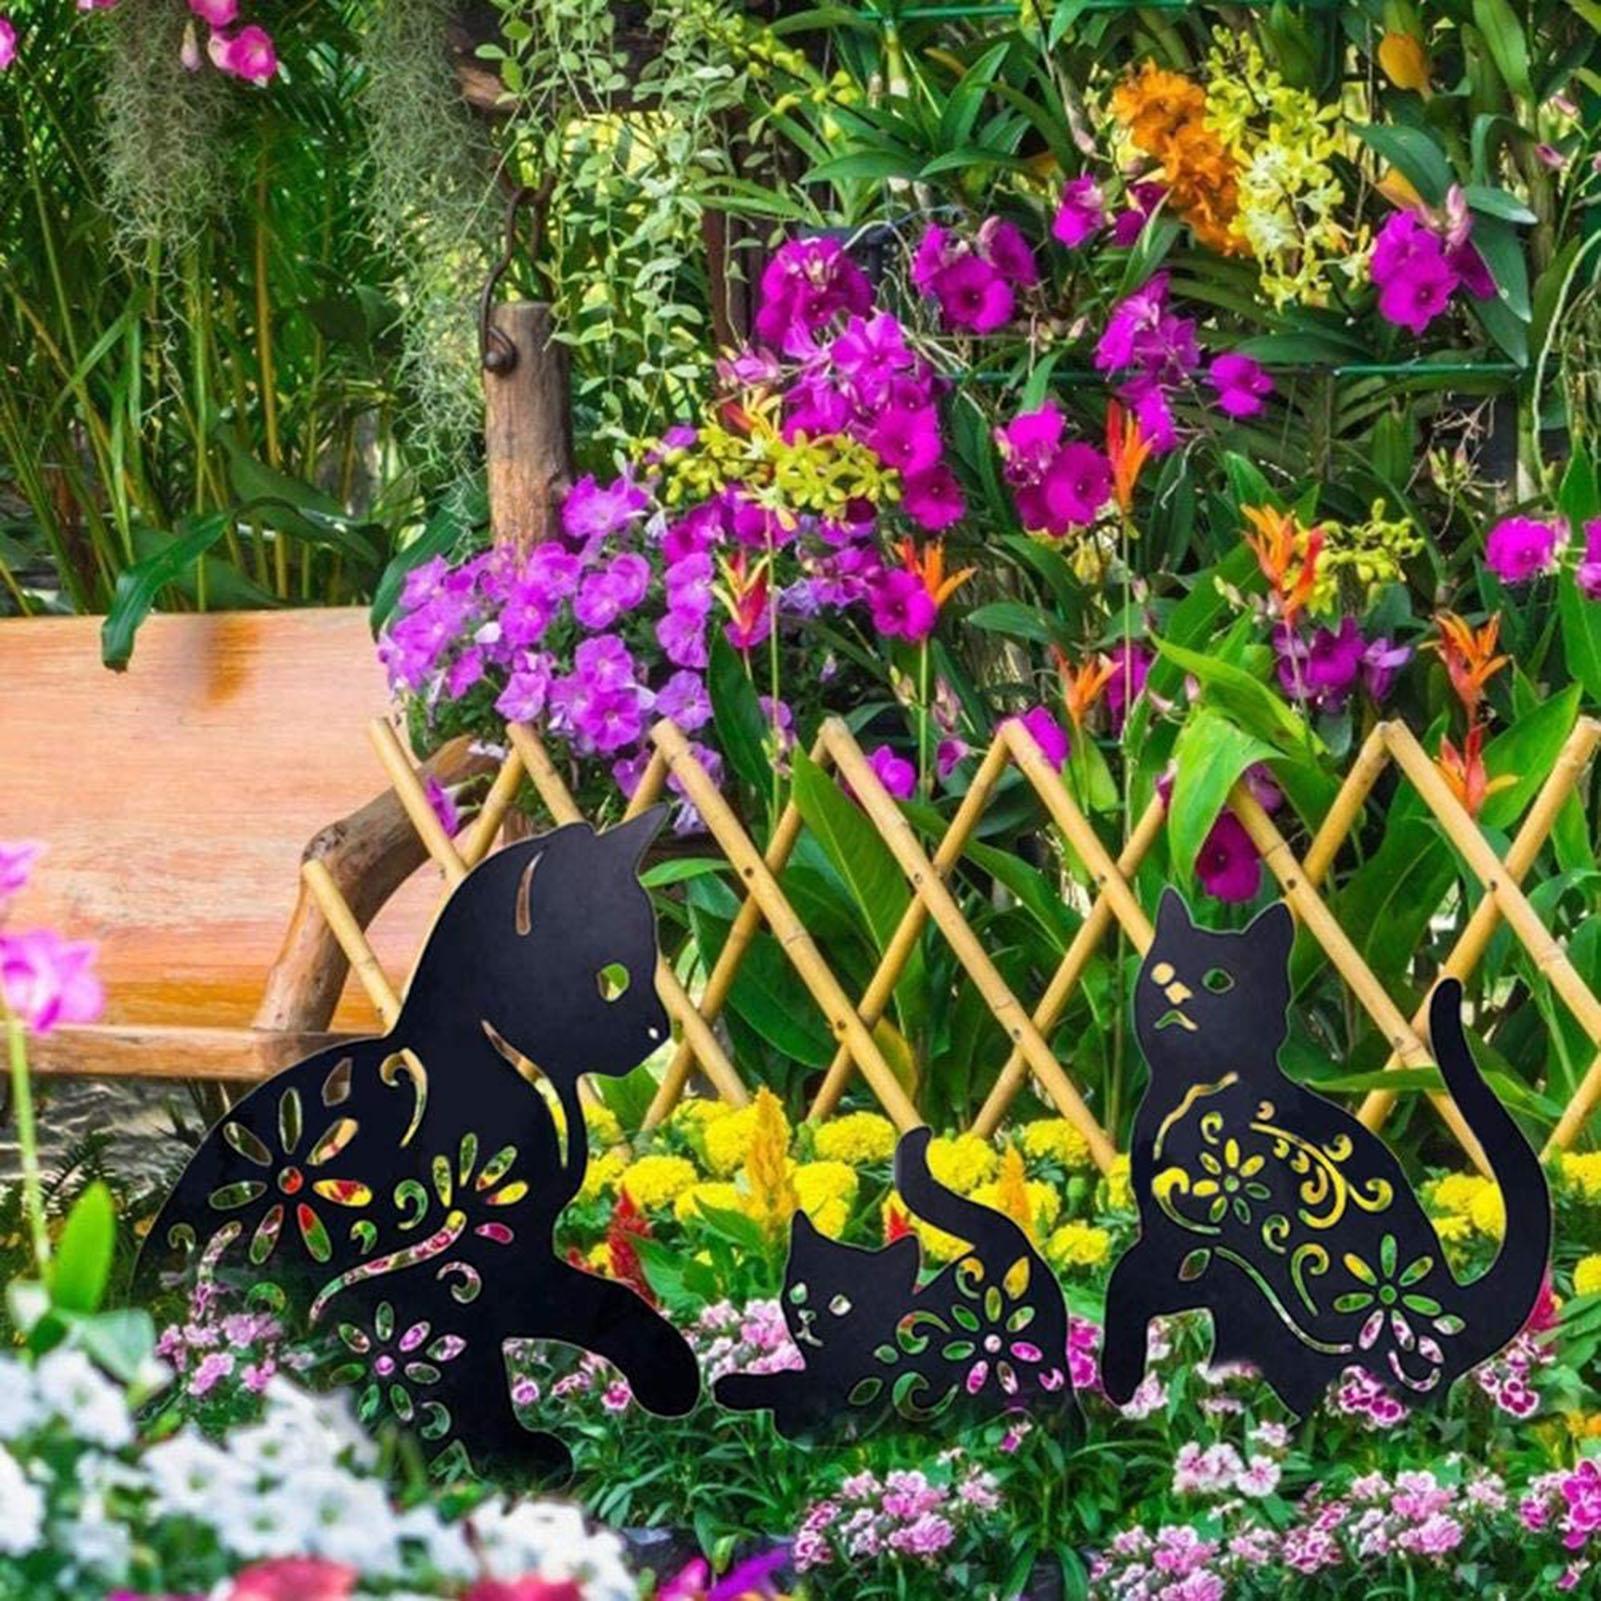 2D القط الشكل إدراج الأرض ديكور الجوف نابض بالحياة هريرة معدنية تمثال الوتد للخارجية حديقة مانور الحديقة السوداء B1